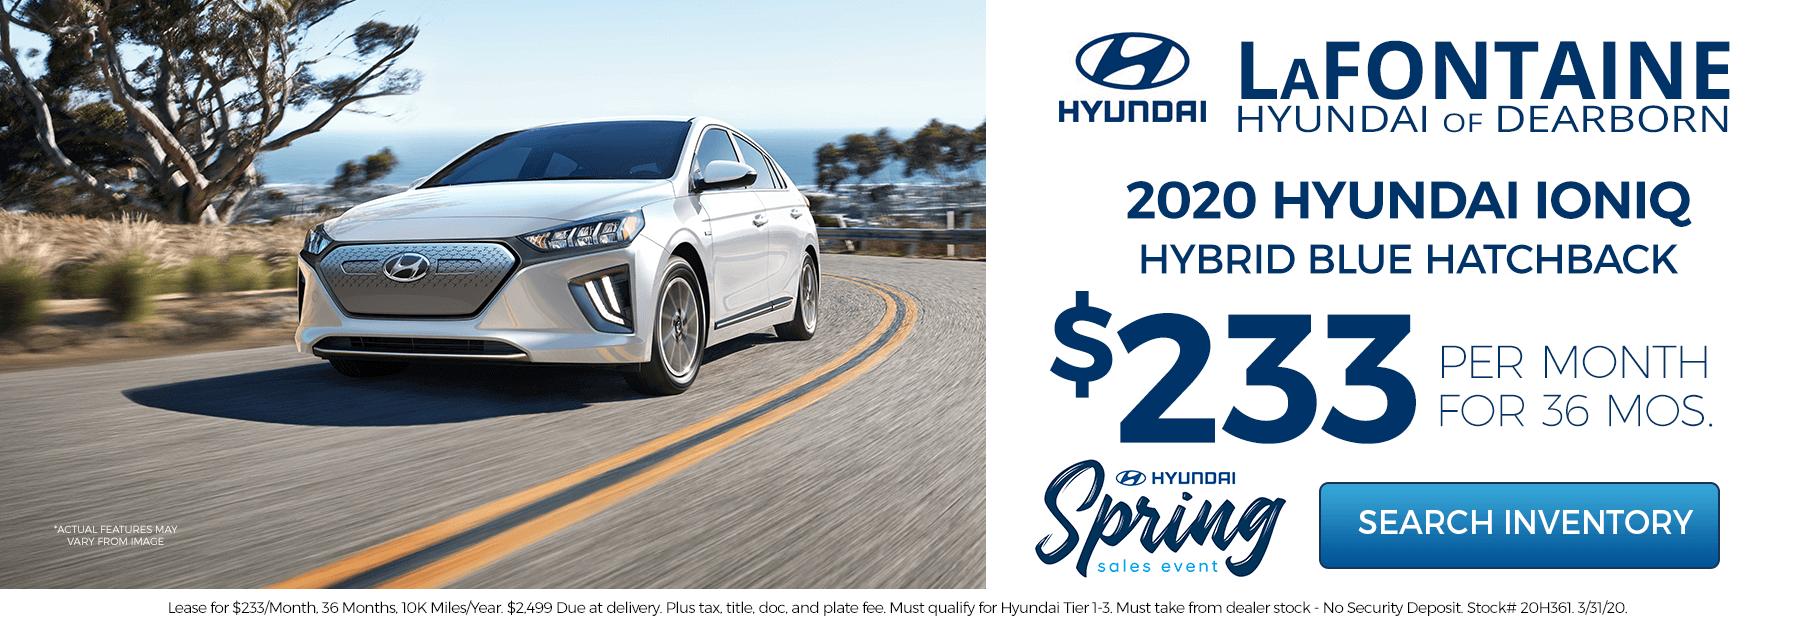 1800x625 HyundaiBanner NEW Ioniq